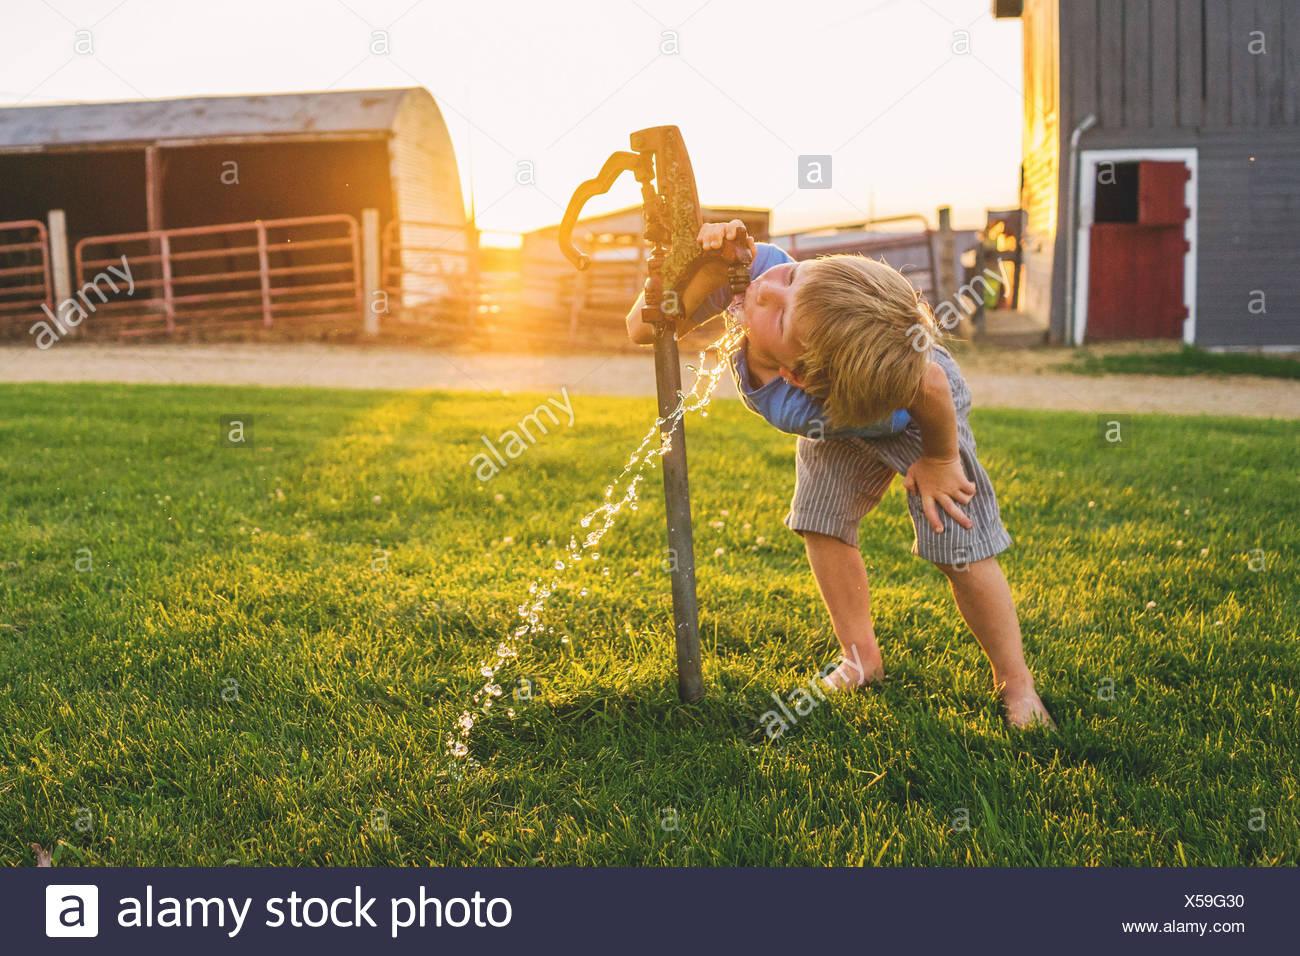 Chico de beber agua de grifo en una granja Imagen De Stock